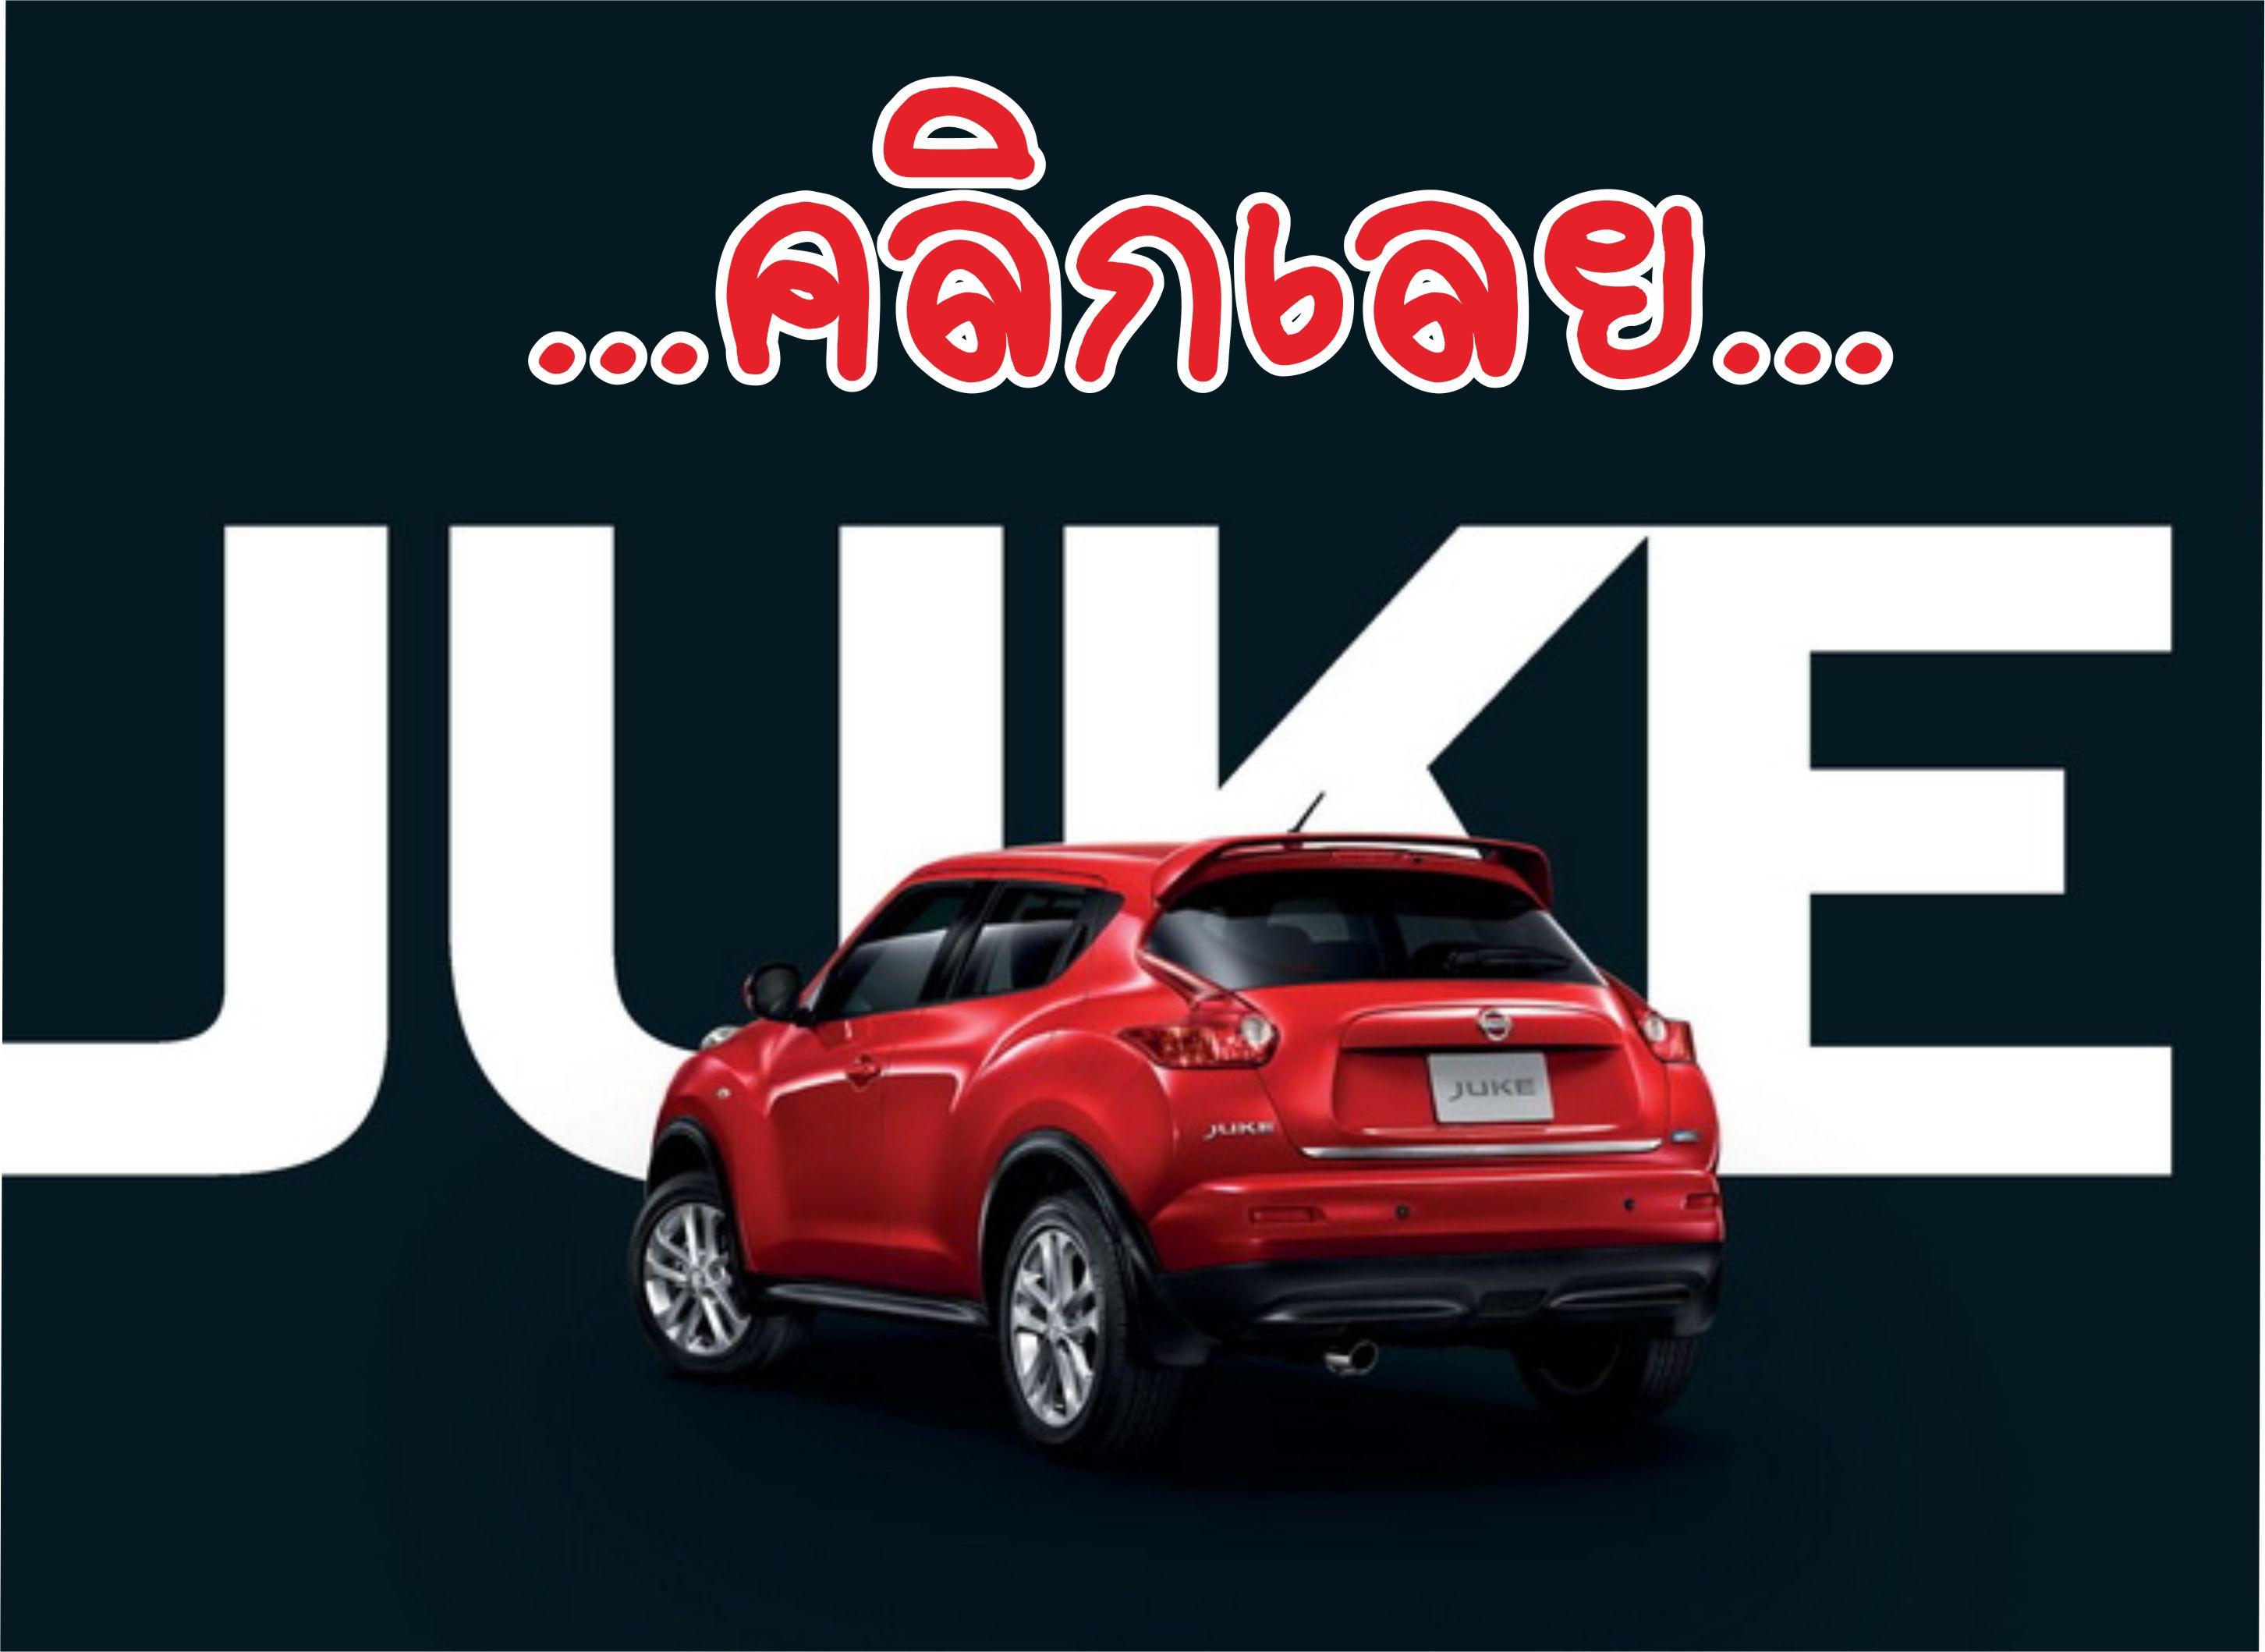 nissan juke แต่งลายนิสสัน juke ติดสติกเกอร์ nissan juke  sticker nissan juke  ลายnismo nissan juke สตืกเกอร์ติดข้างรถ JUKE หูกระจกแดง nissan juke nissan juke แต่งสวย ลาย nissan juke joint edition